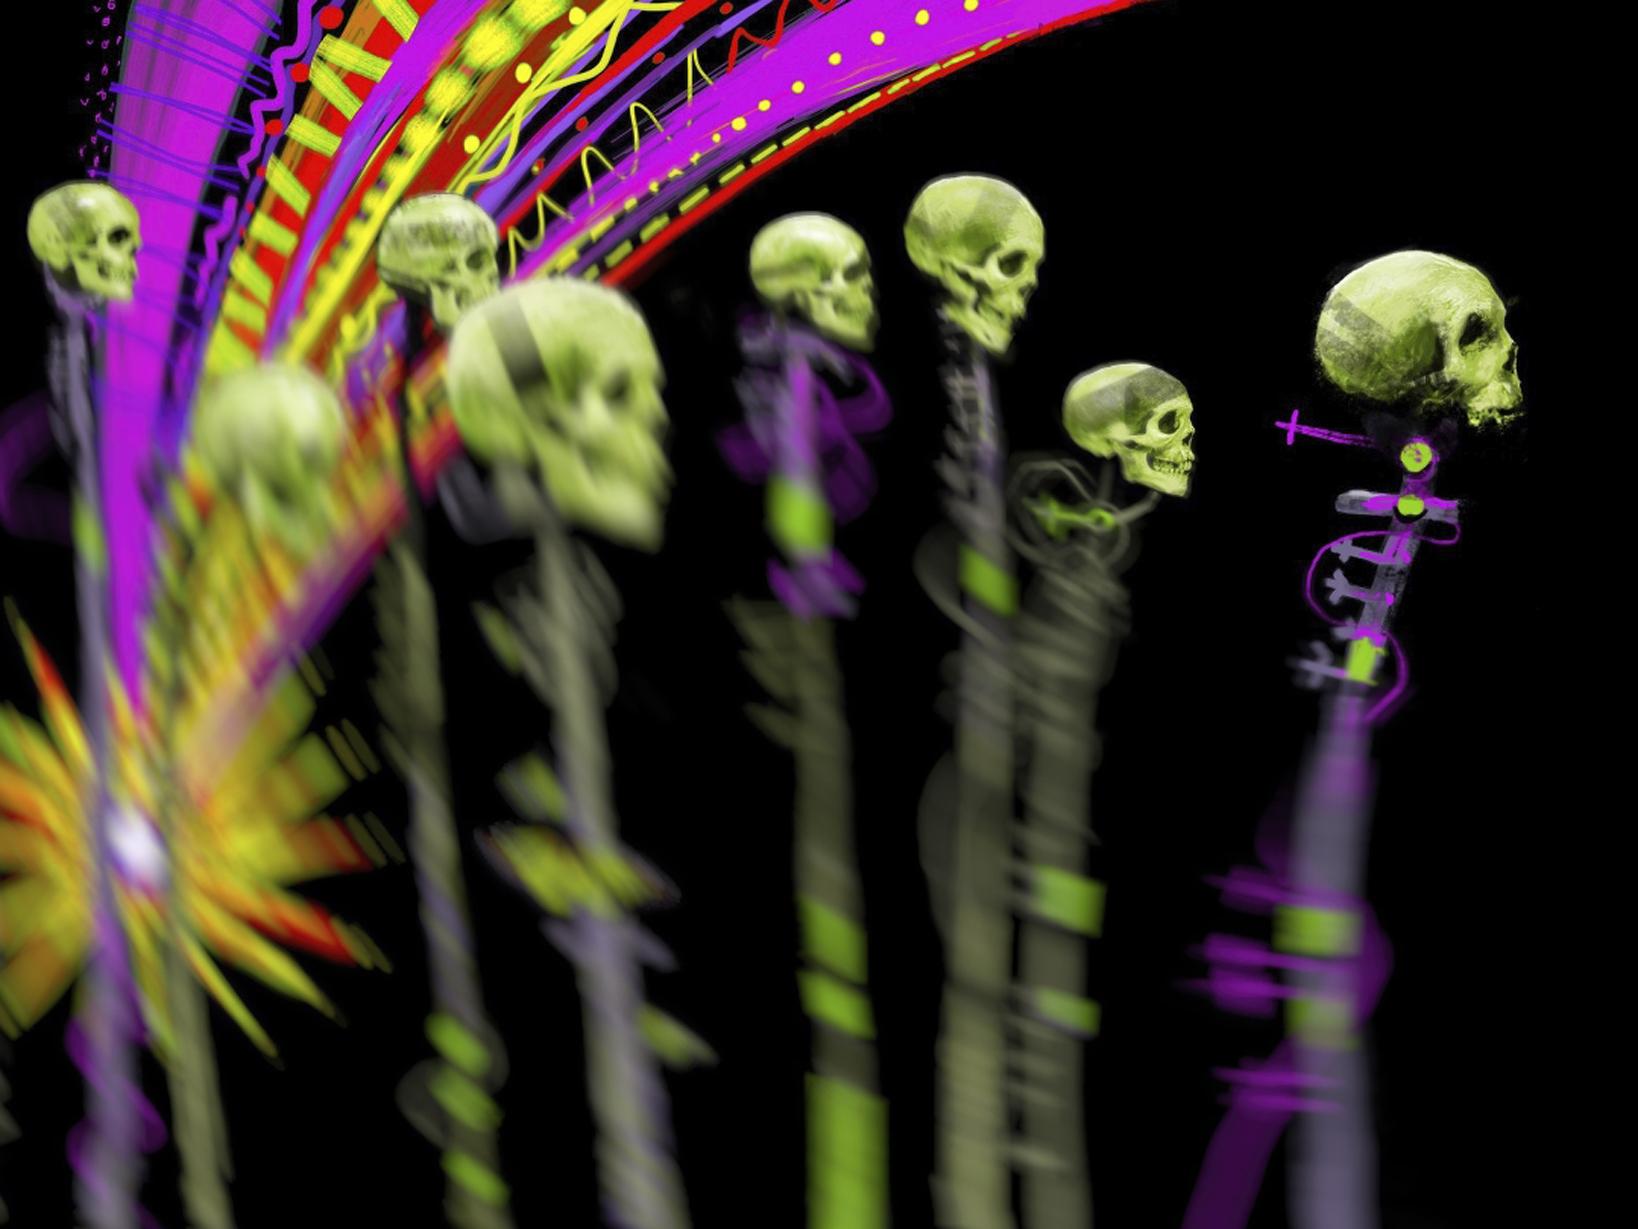 Working Skull Parade_Bokeh.jpg